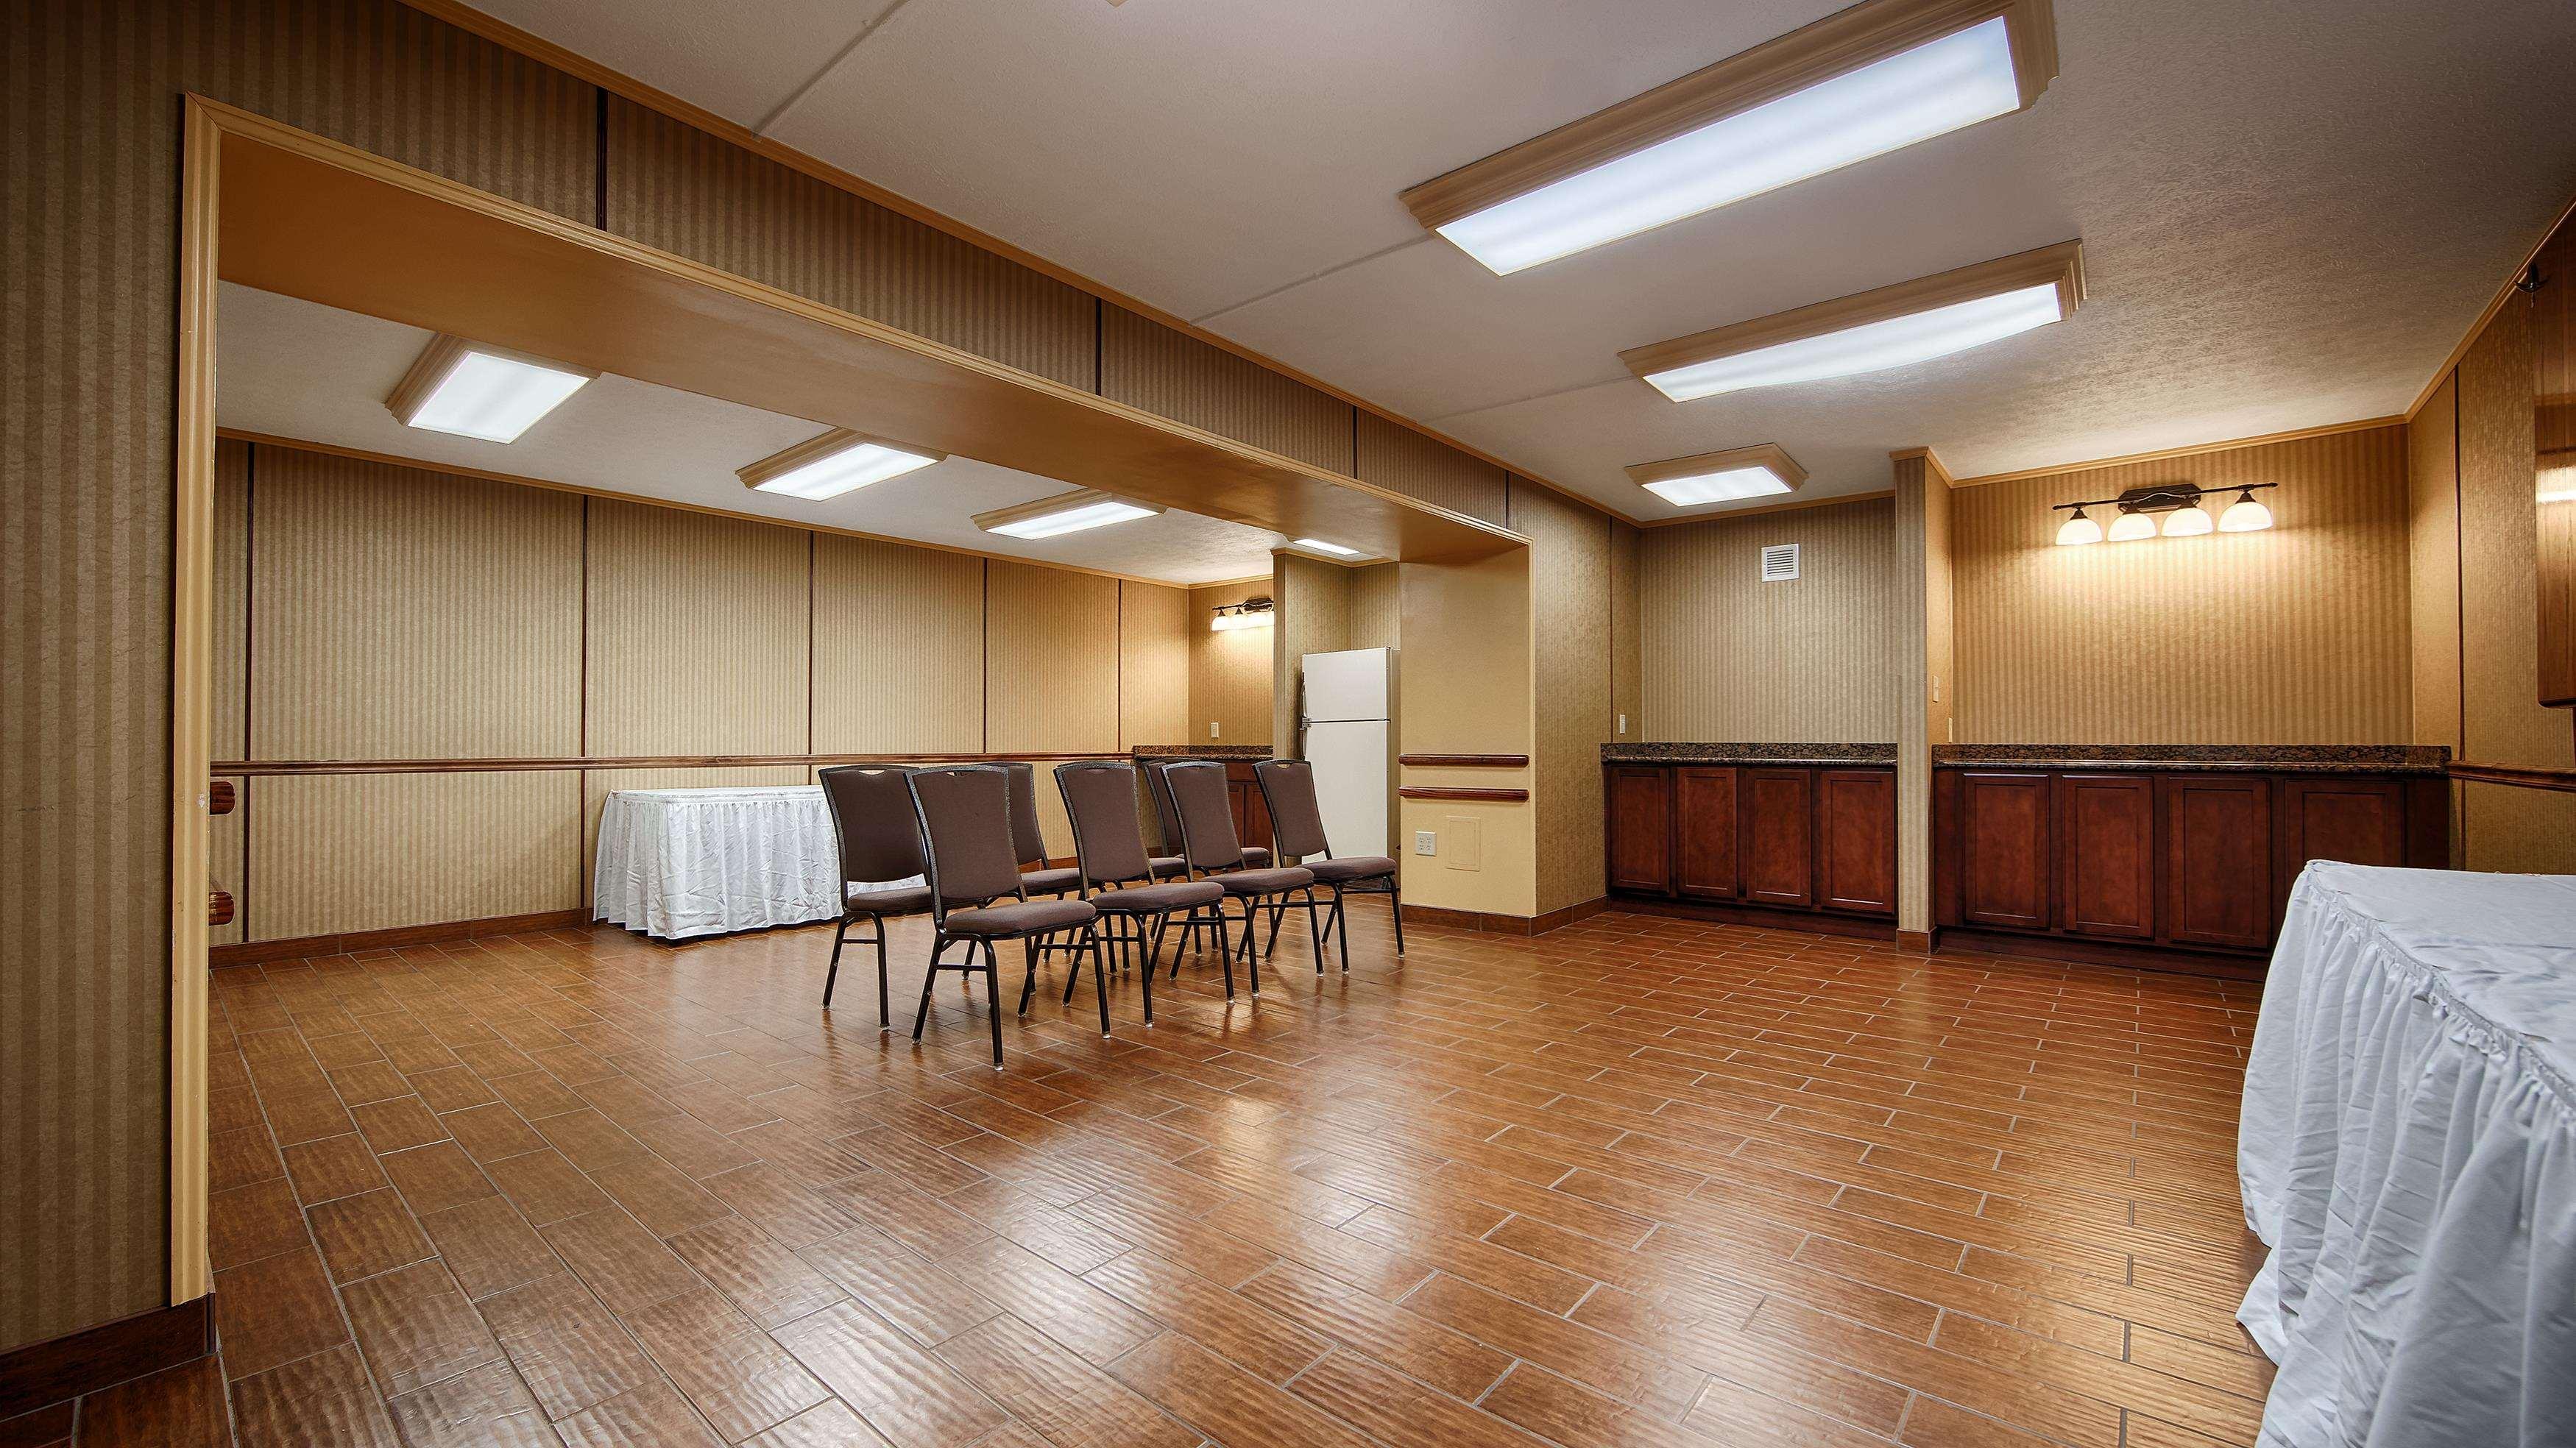 best western aquia quantico inn stafford virginia va. Black Bedroom Furniture Sets. Home Design Ideas